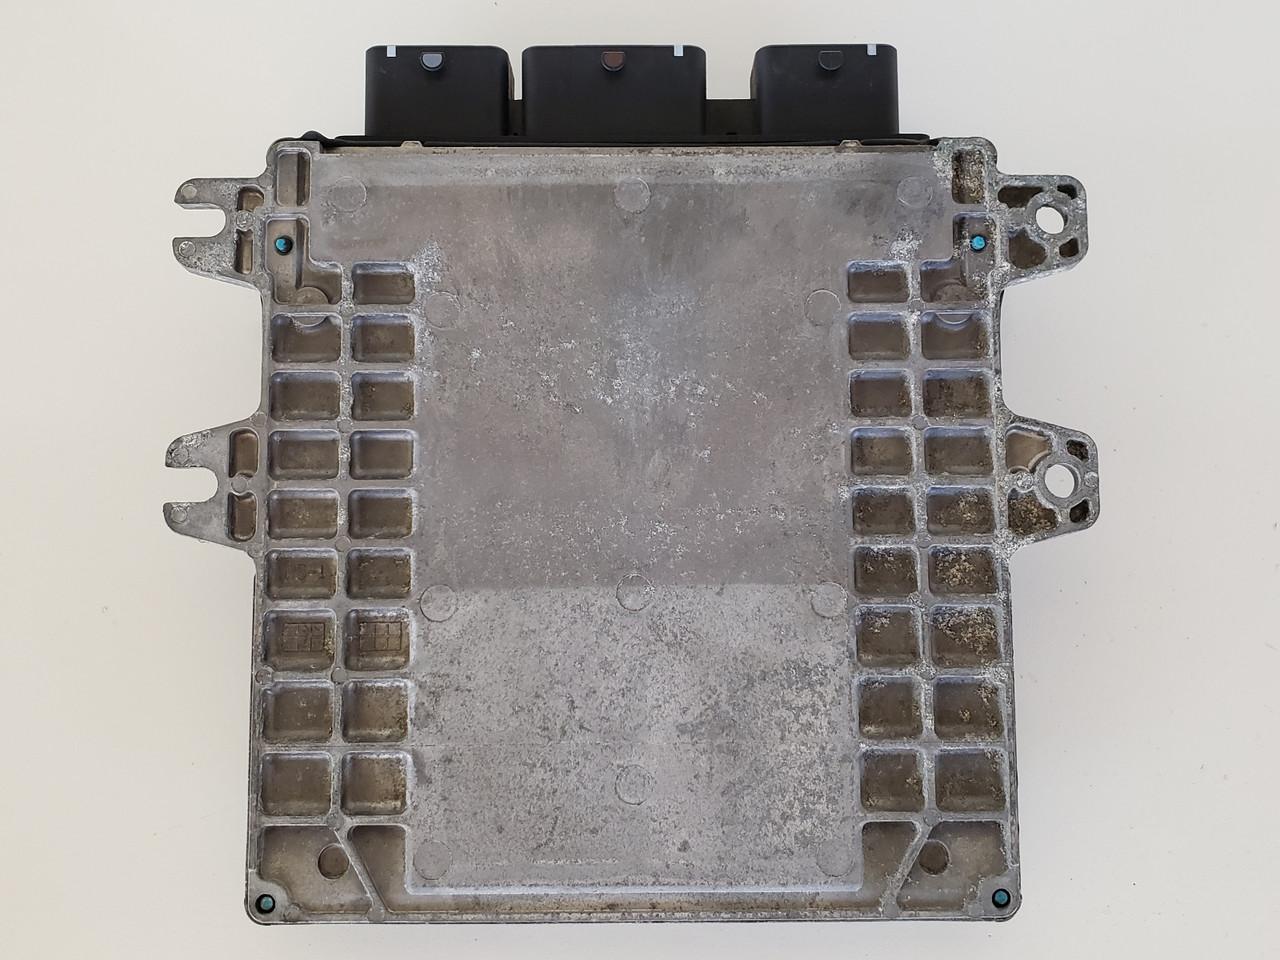 2010 Nissan Rogue MEC112-040 C1 Computer Brain Engine Control ECU ECM EBX Module